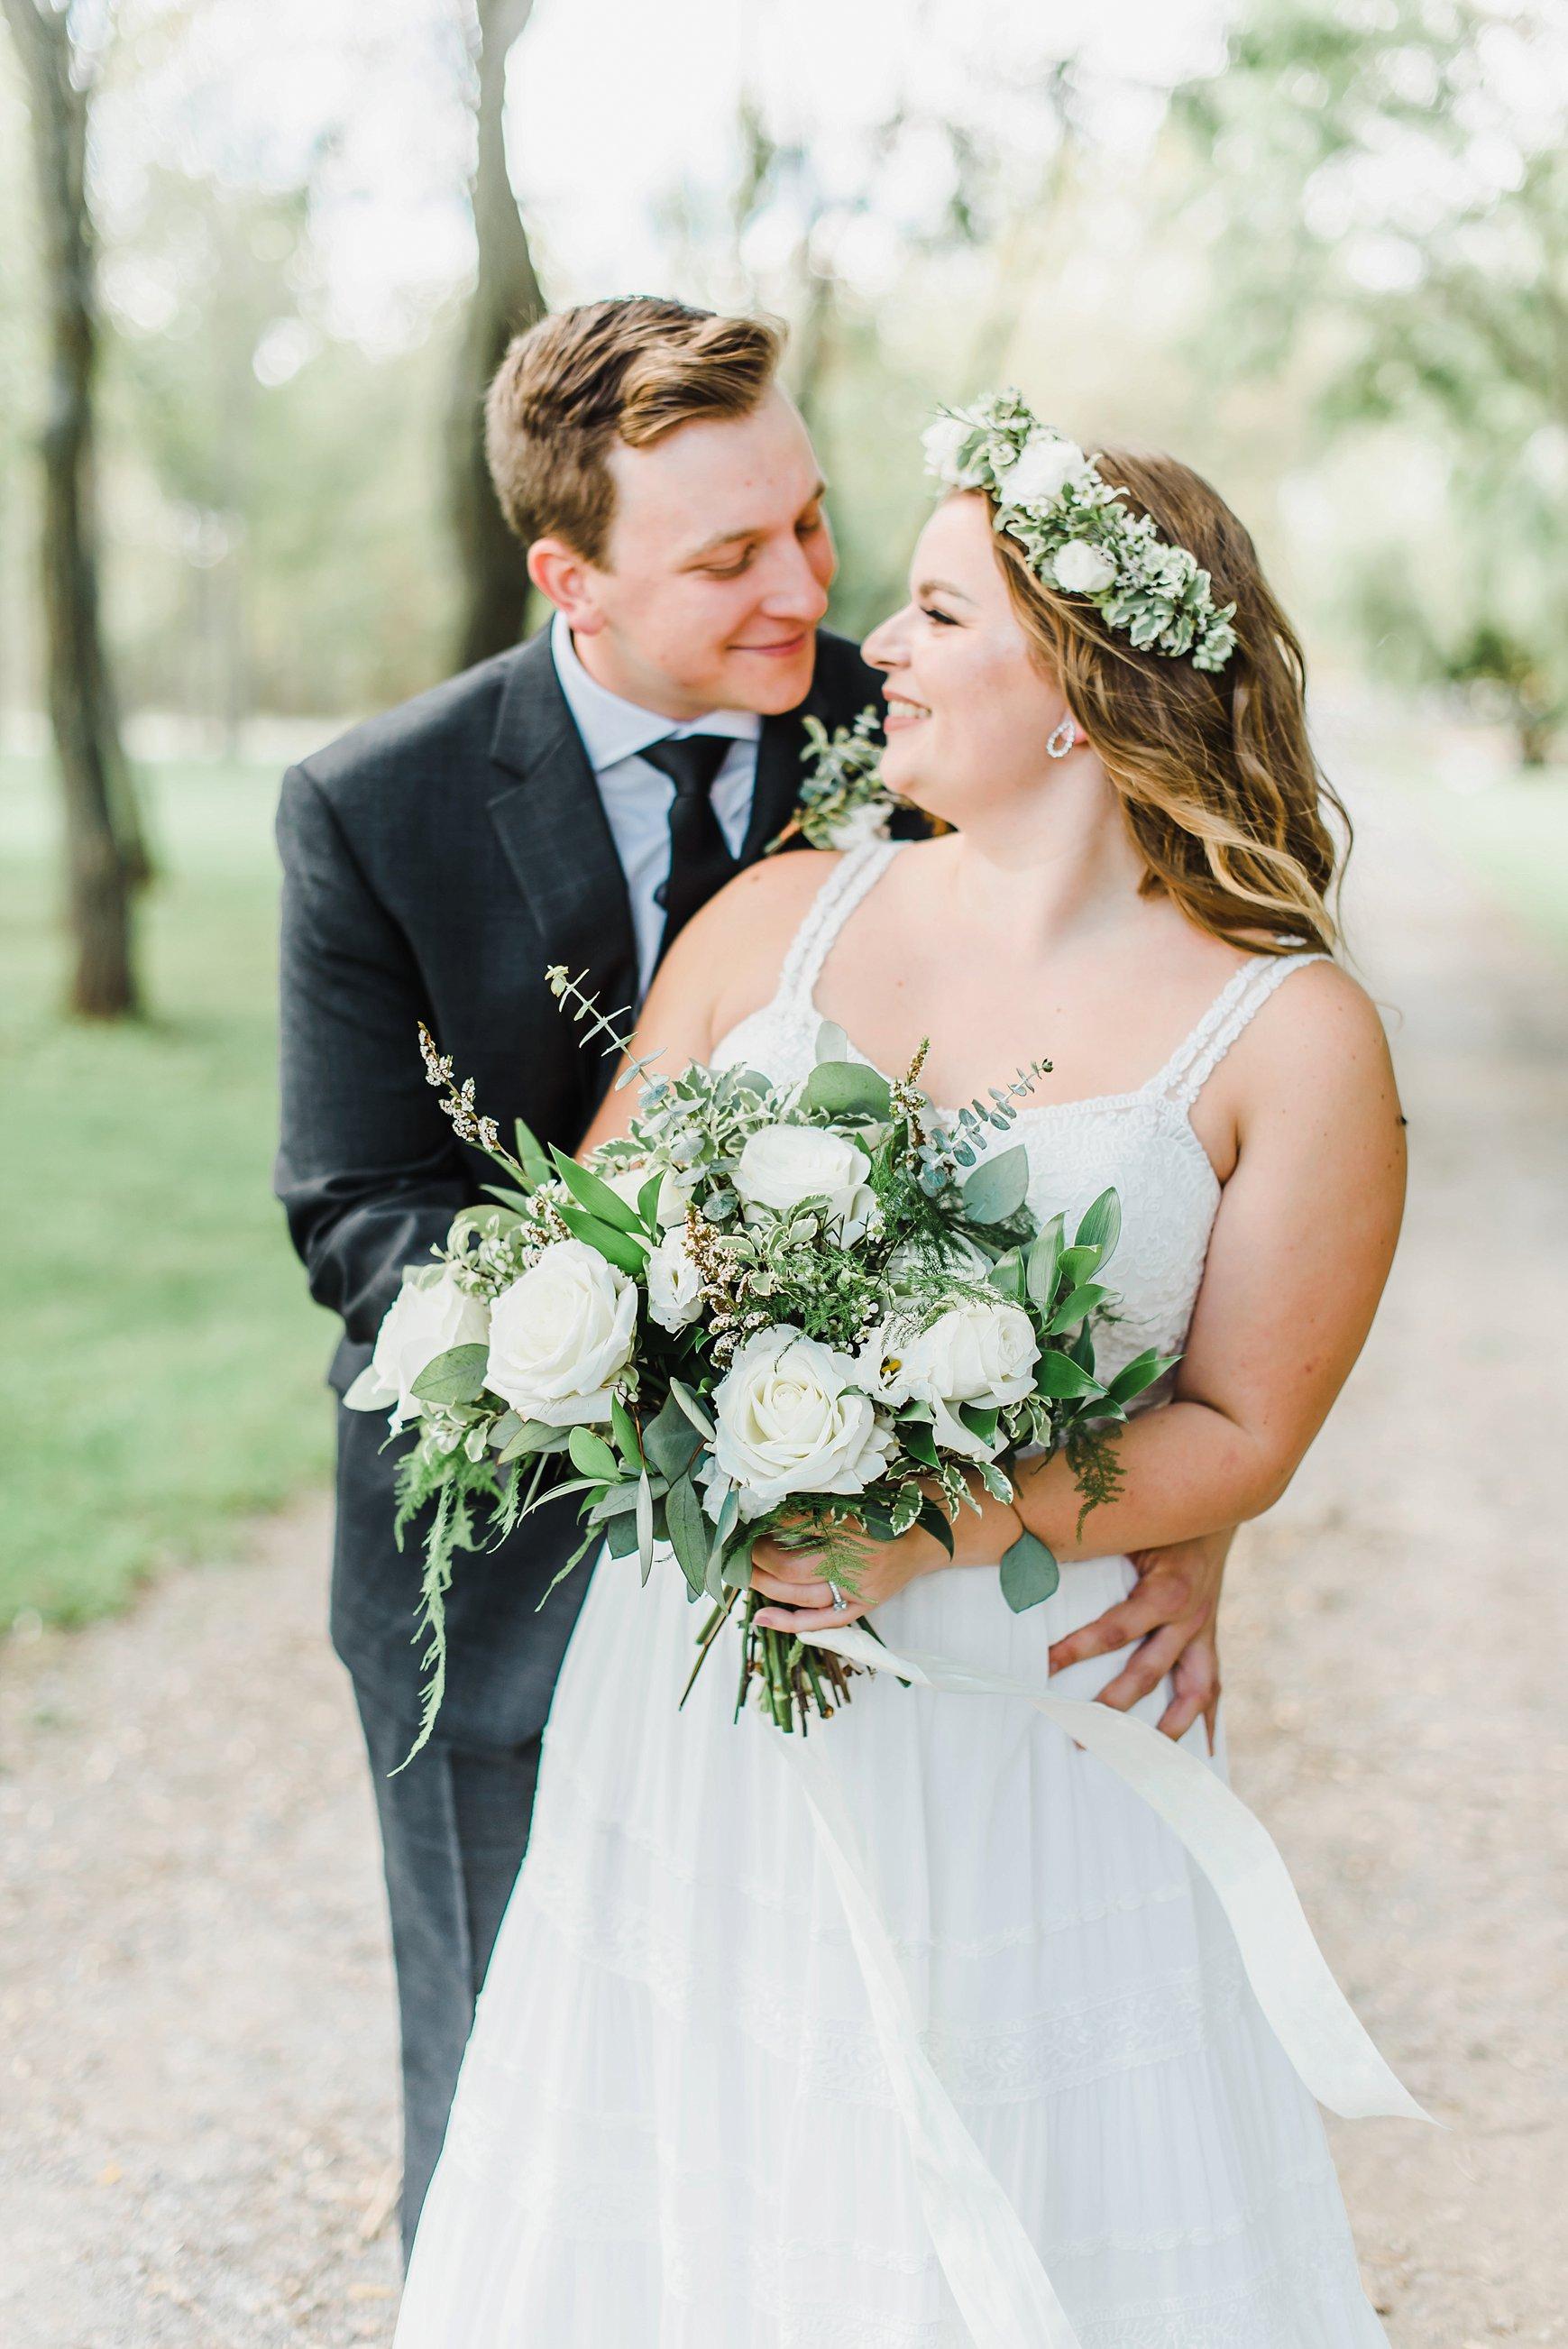 light airy indie fine art ottawa wedding photographer | Ali and Batoul Photography_1092.jpg